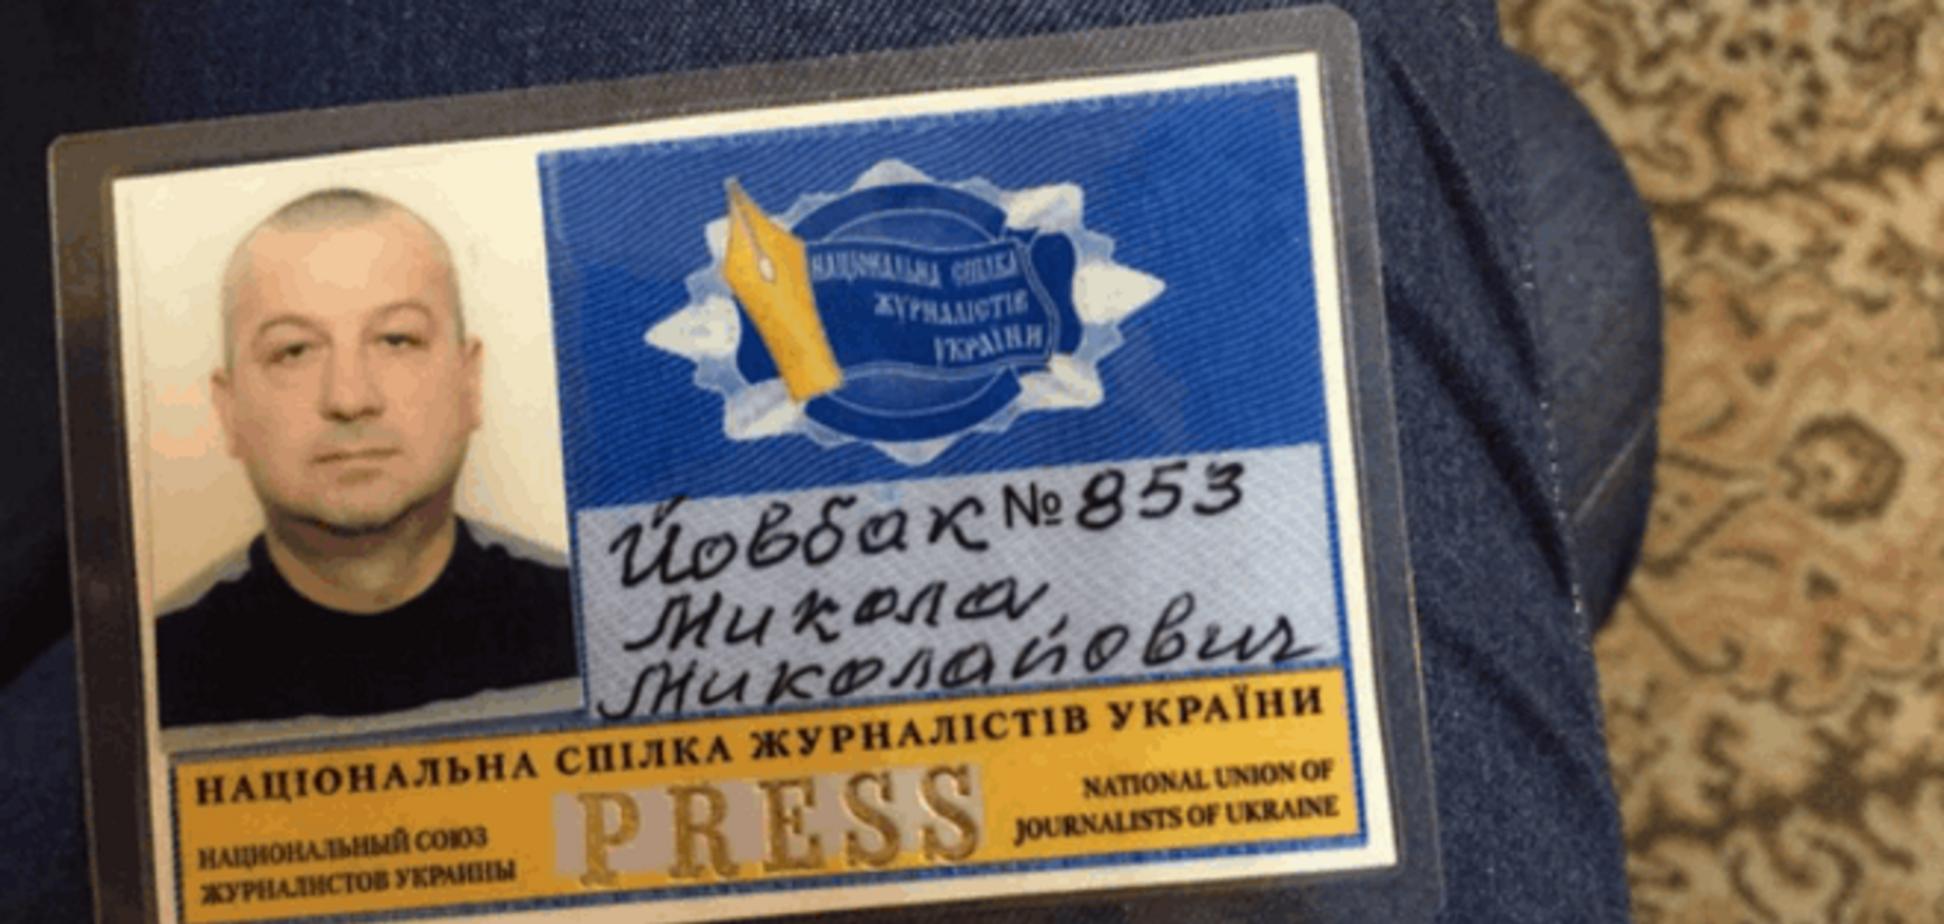 'Не титушку' Йовбака из Мукачево поймали на подделке удостоверения